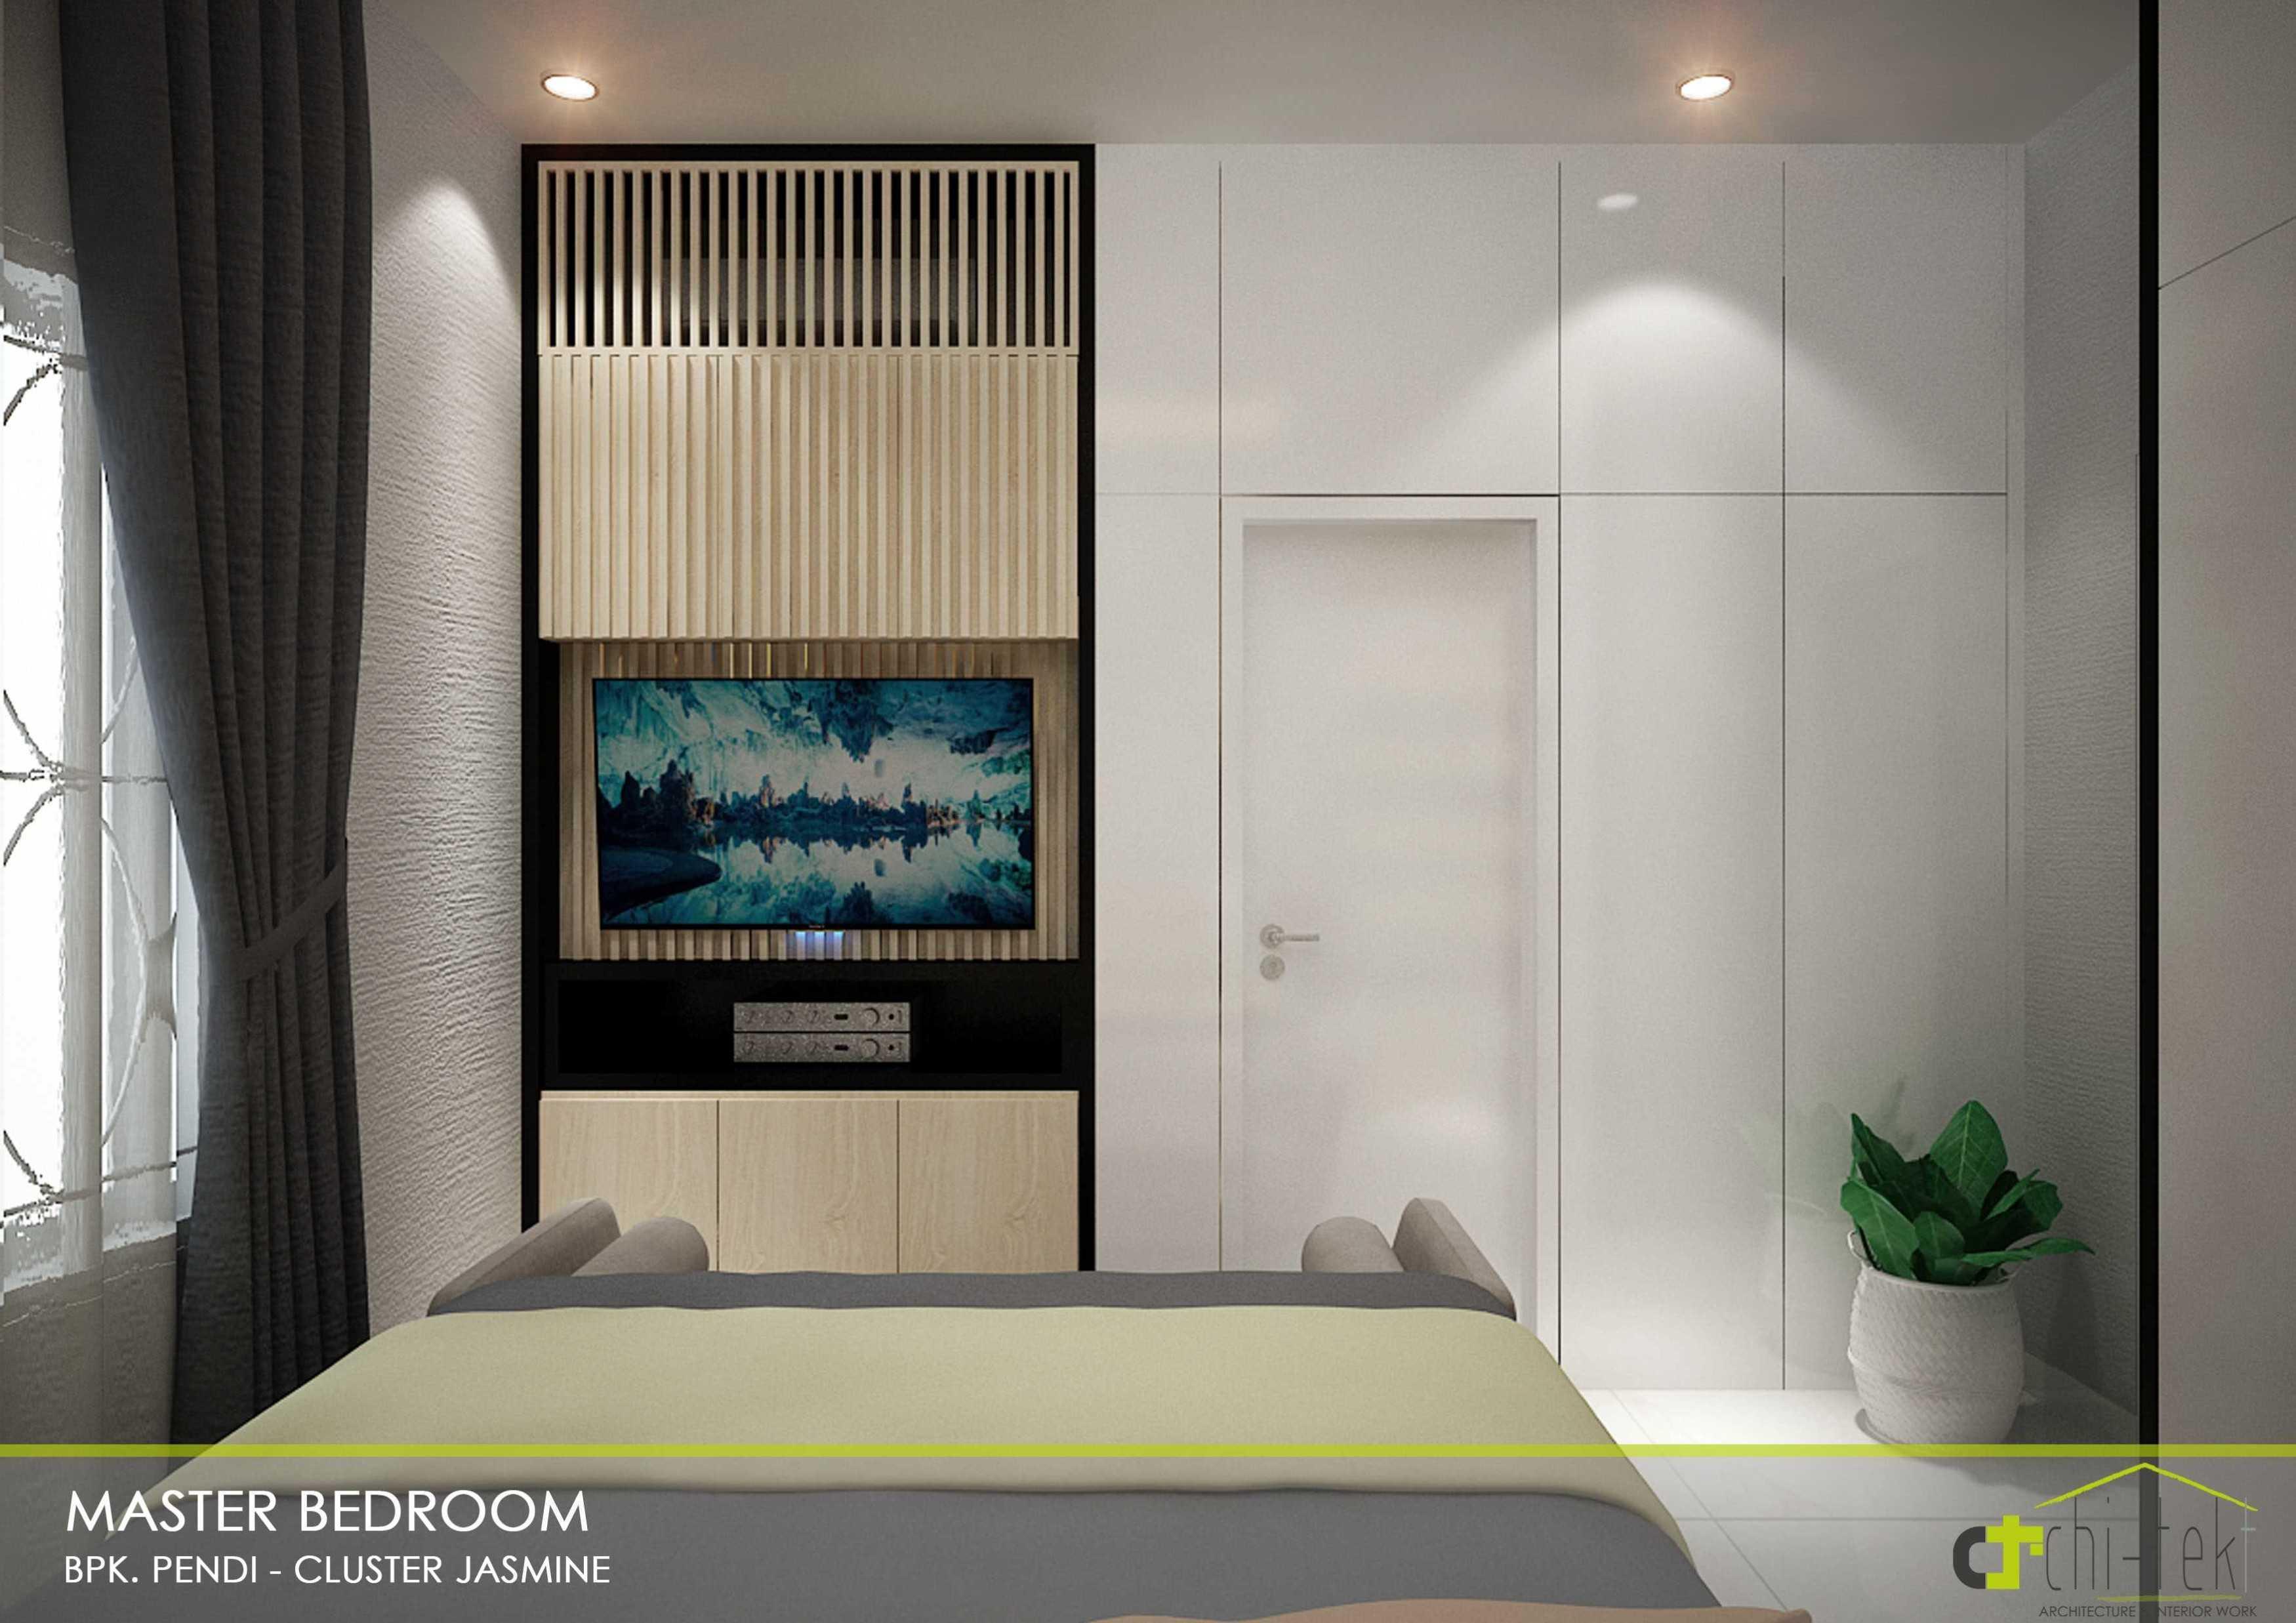 Dtarchitekt Jasmine Master Bedroom  West Pakulonan, Kelapa Dua, Tangerang, Banten 15810, Indonesia 3   30405